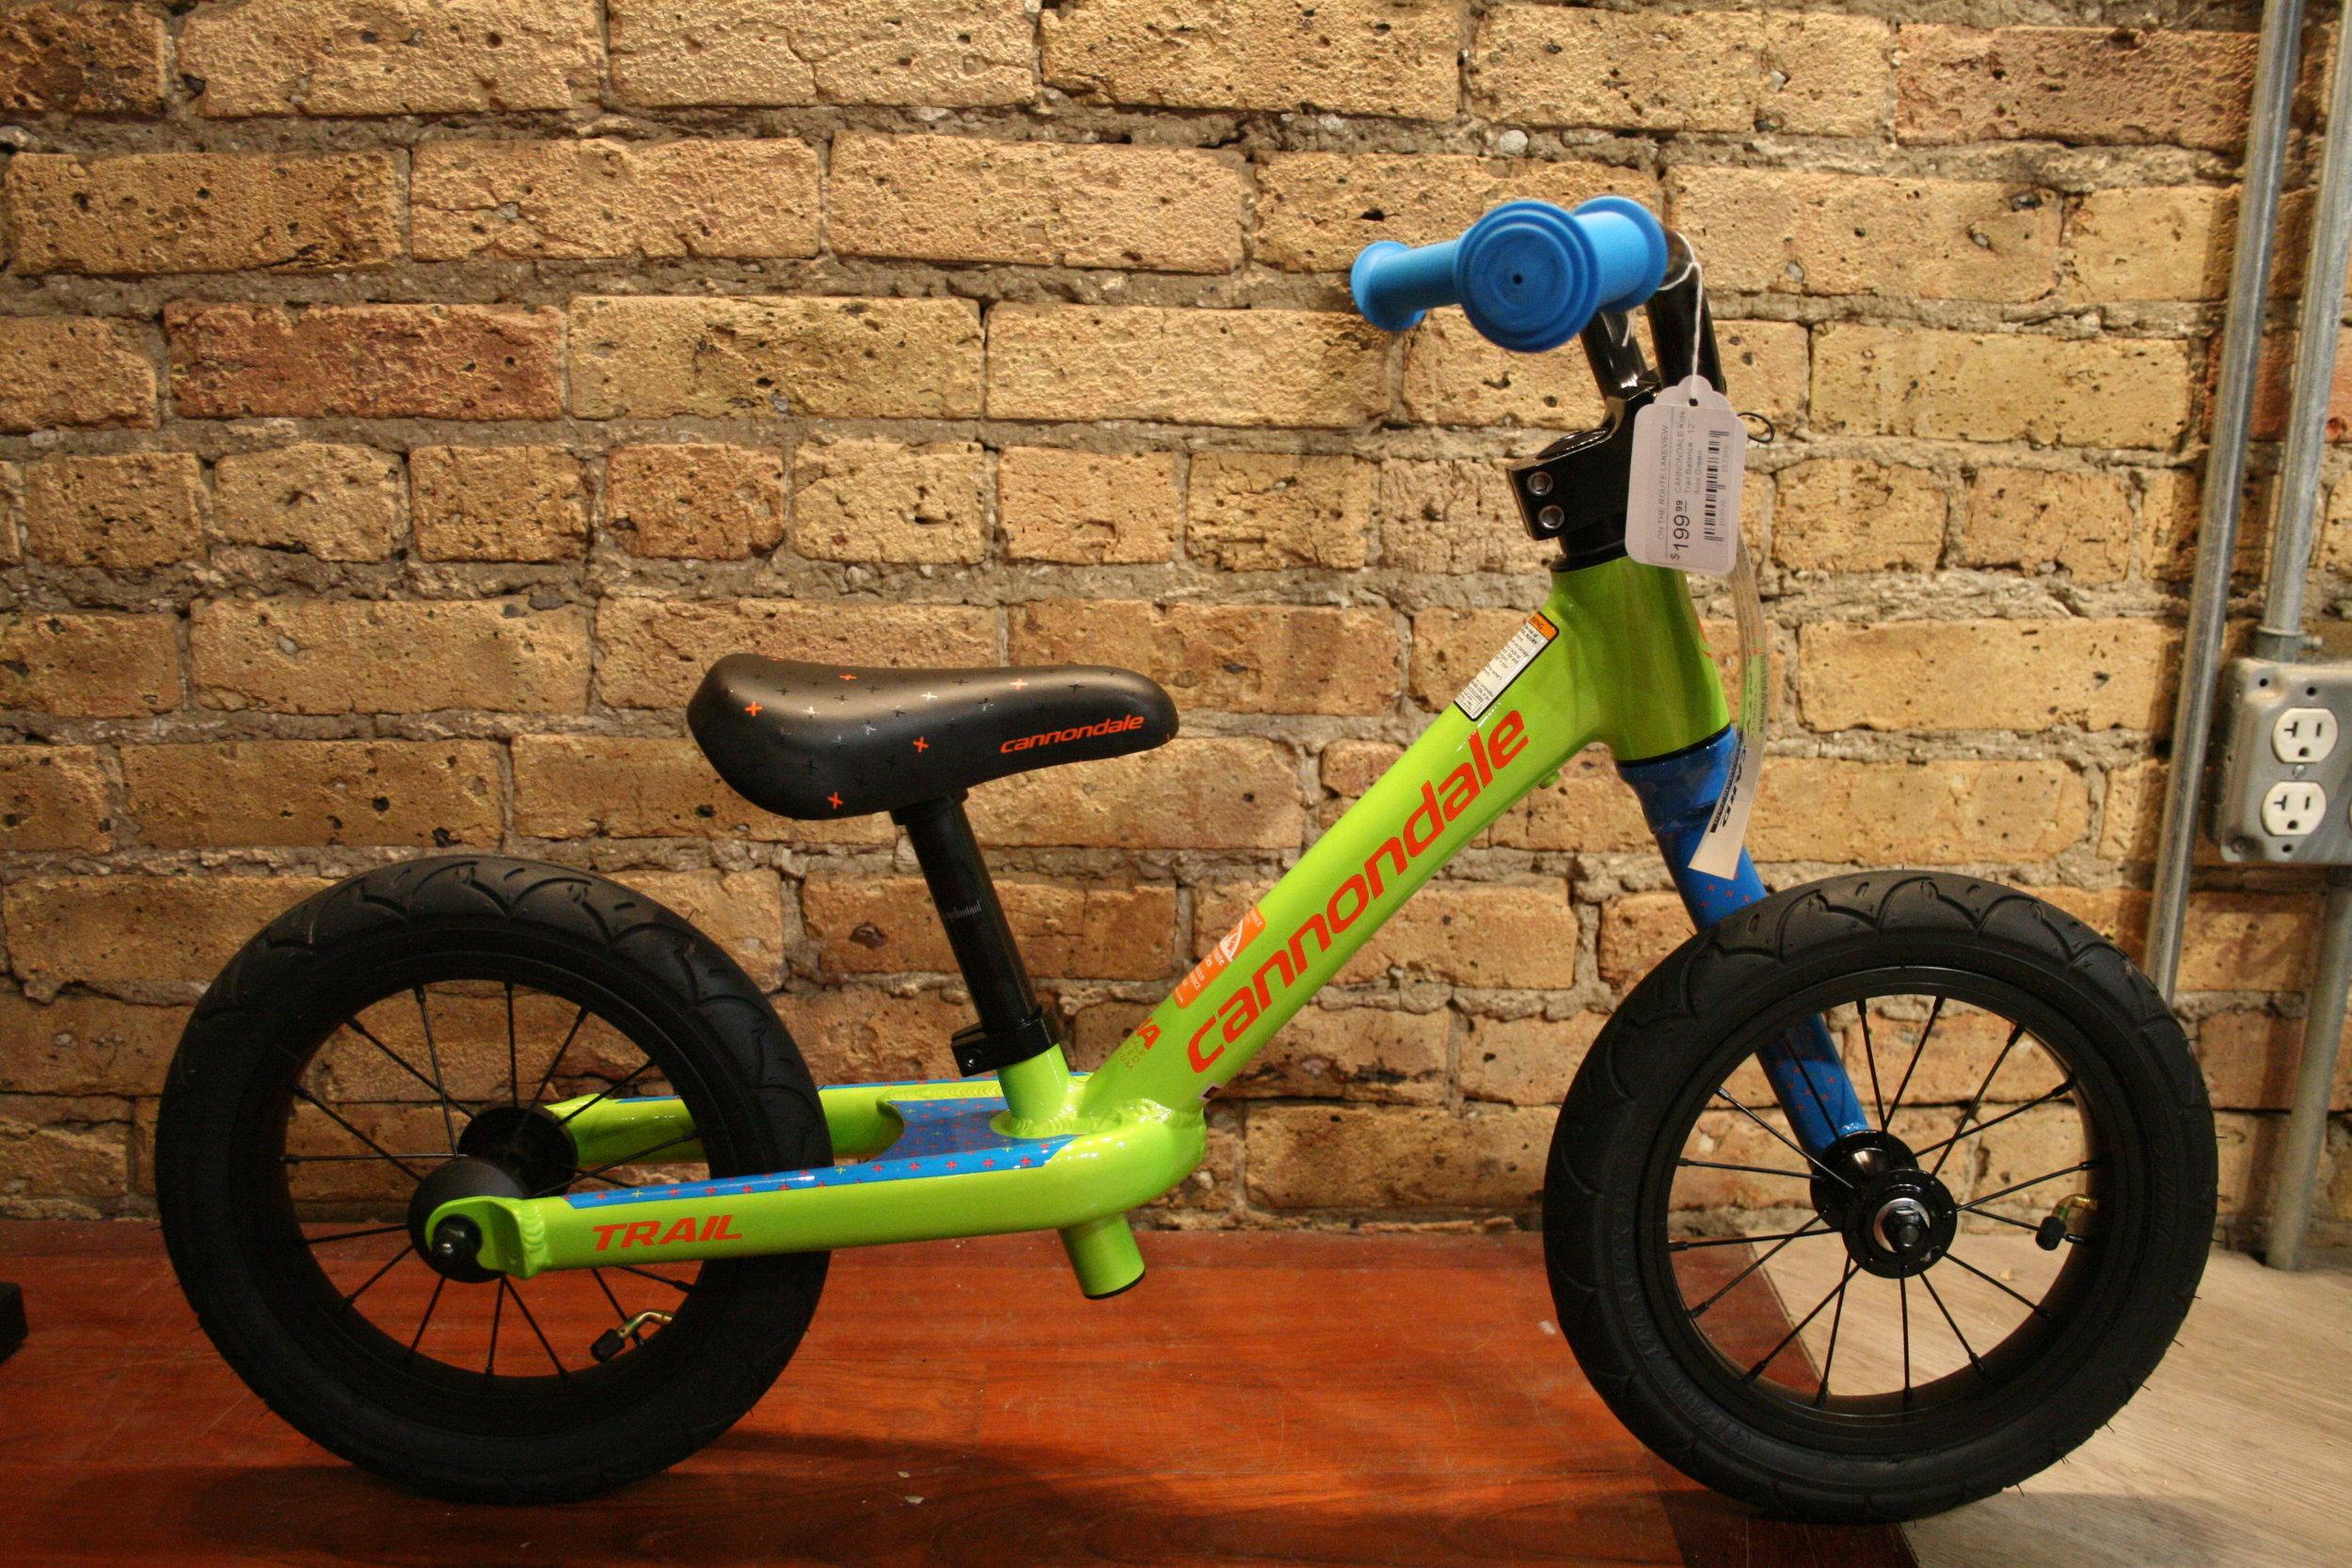 "Cannondale Trail 12"" Balance Bike - $199.99"